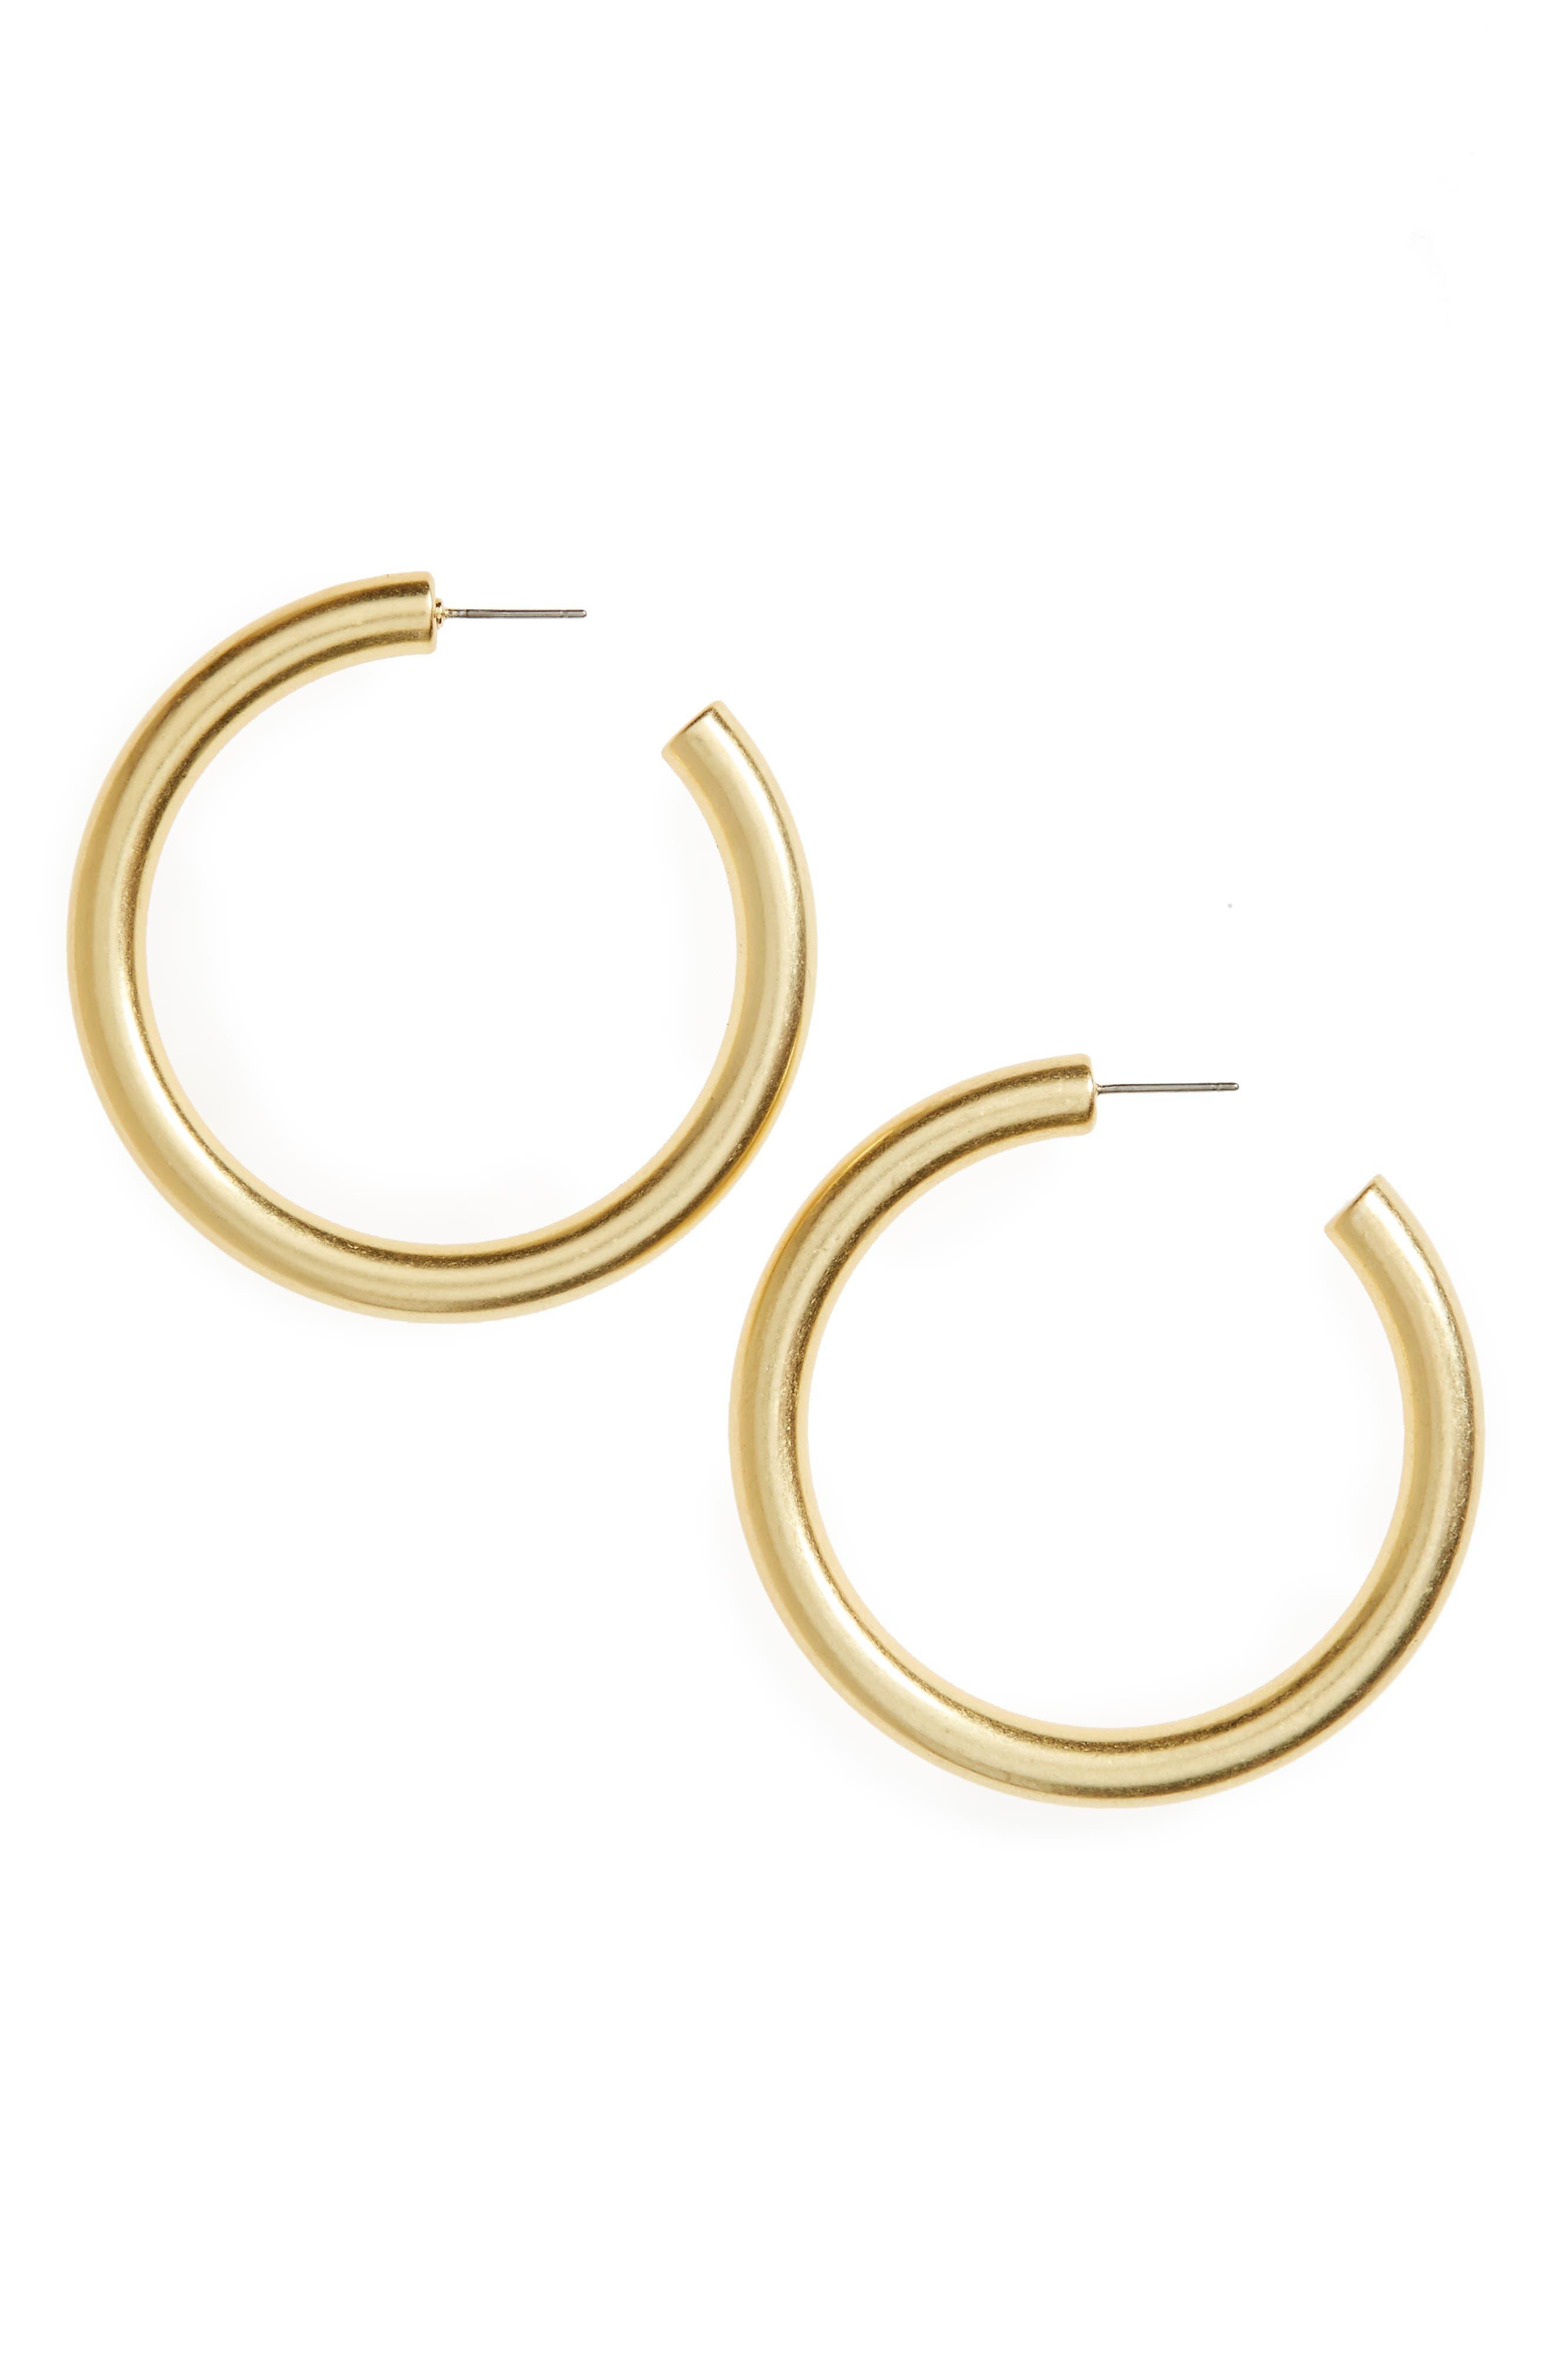 Simply Chunky Hoop Earrings,                             Main thumbnail 1, color,                             710